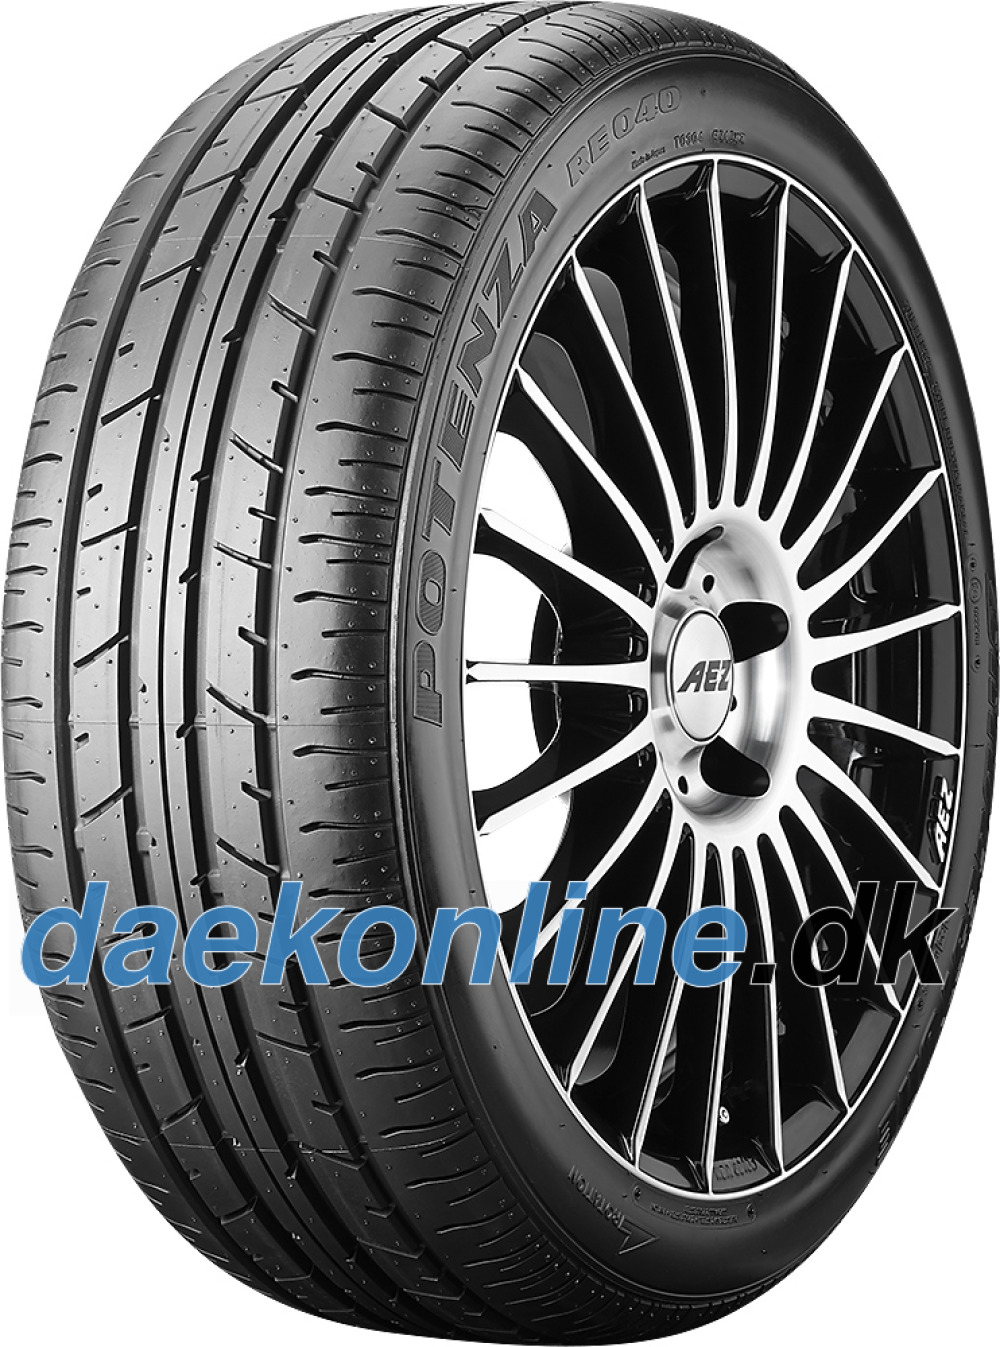 bridgestone-potenza-re-040-17555-r17-81w